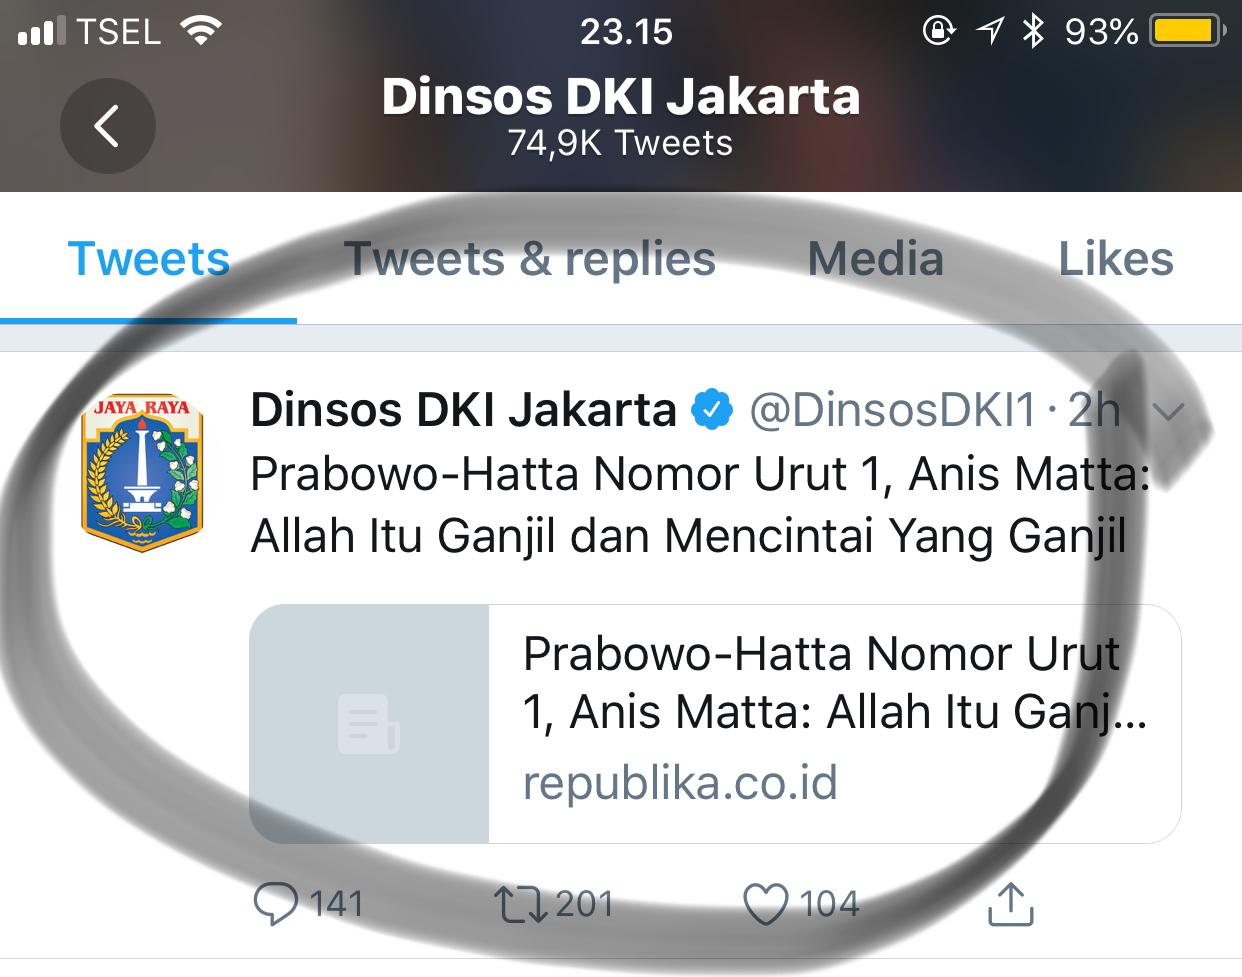 Heboh Kicau Dinsos DKI: Senggol Prabowo dan Anis Matta